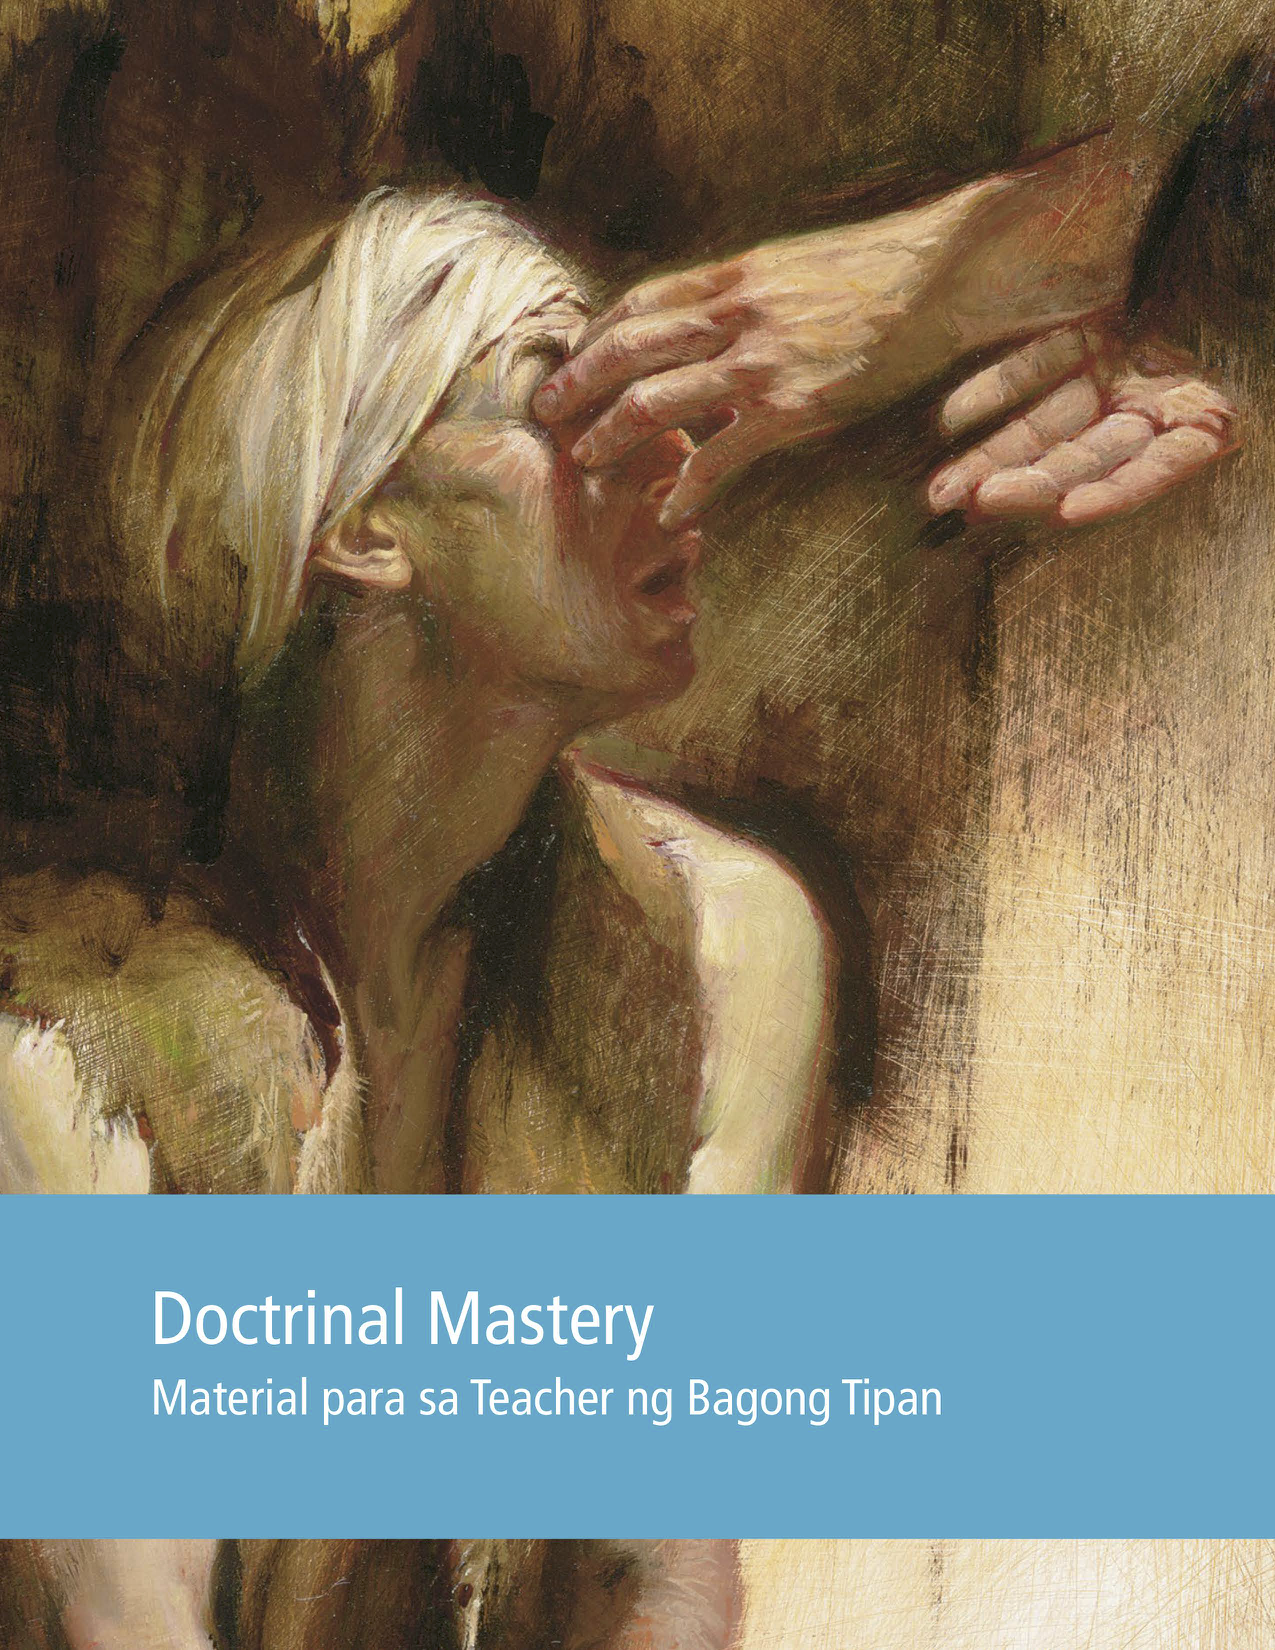 doctrinal mastery material para sa teacher